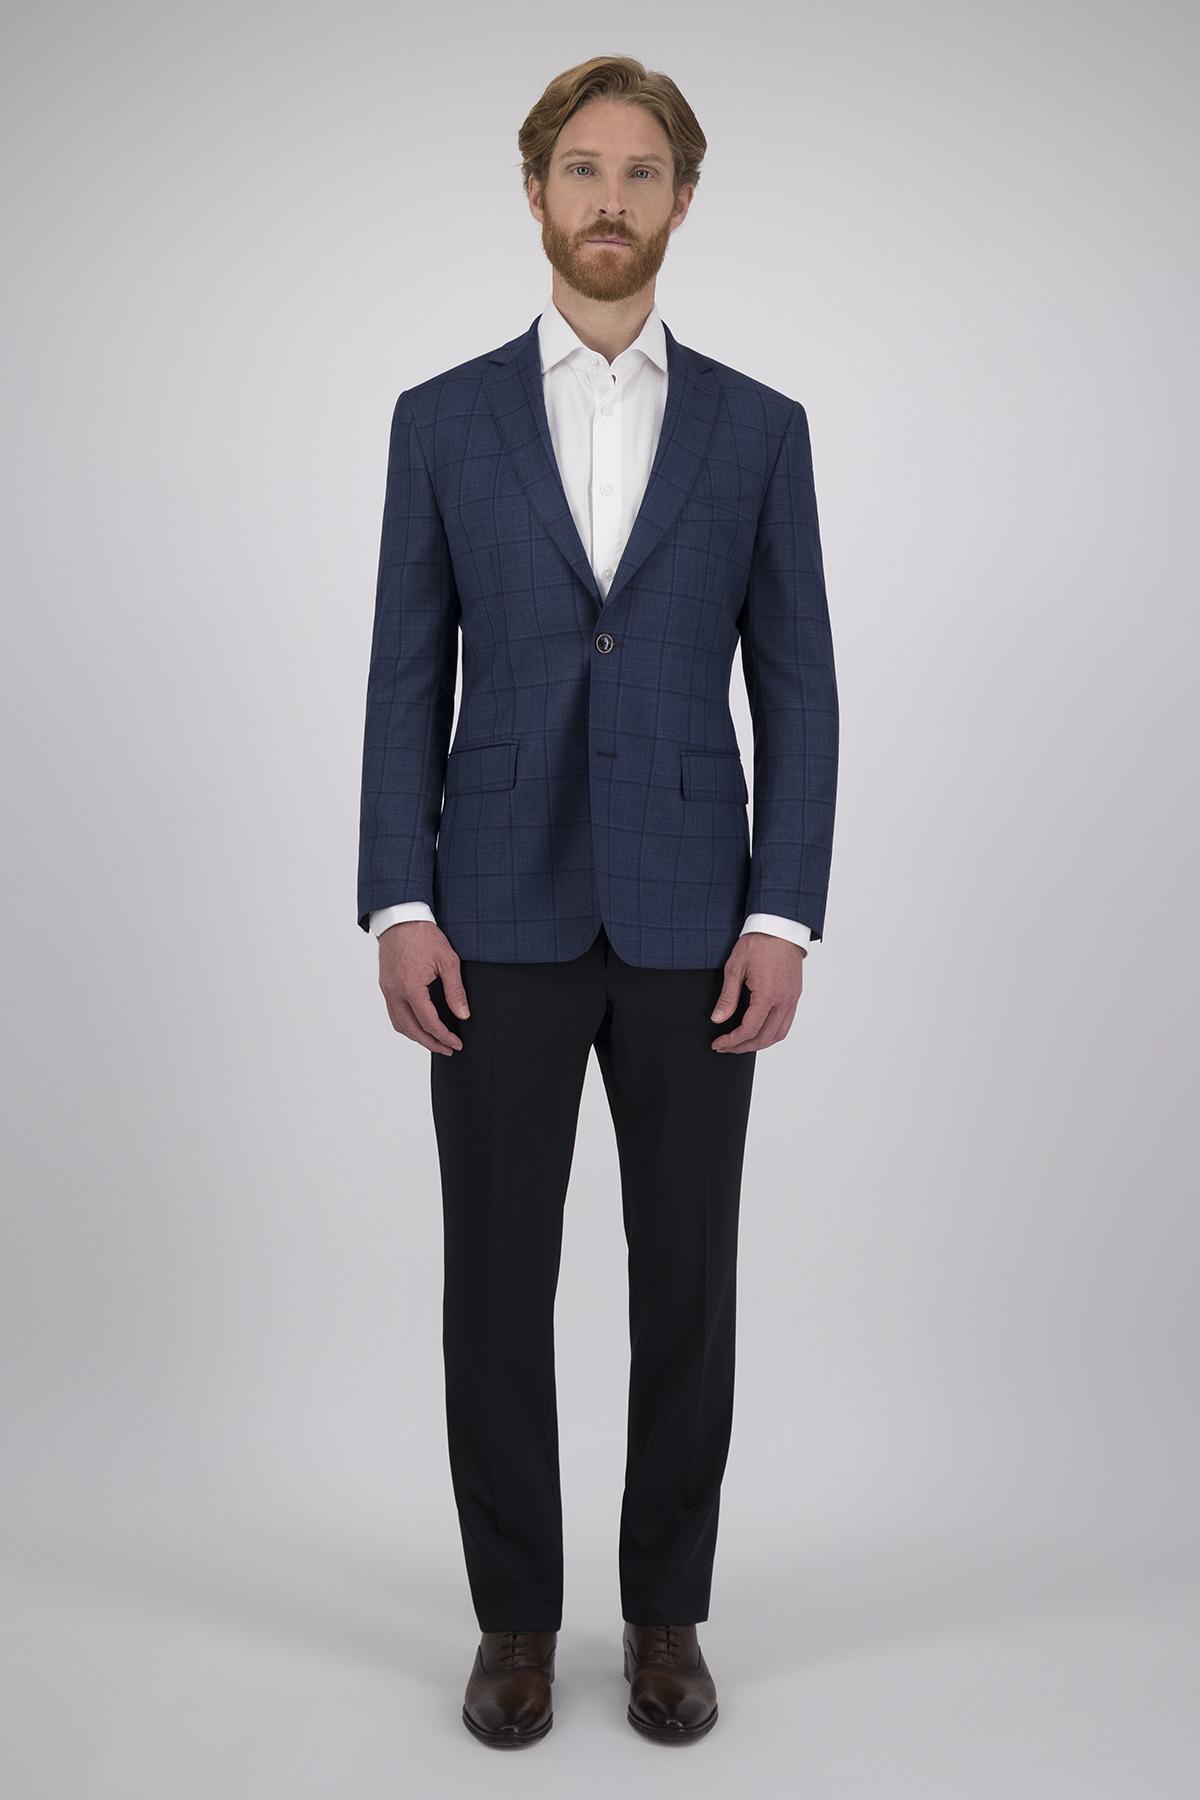 Saco Calderoni Couture Azul a Cuadros, Corte Slim, Tejido 100% Lana